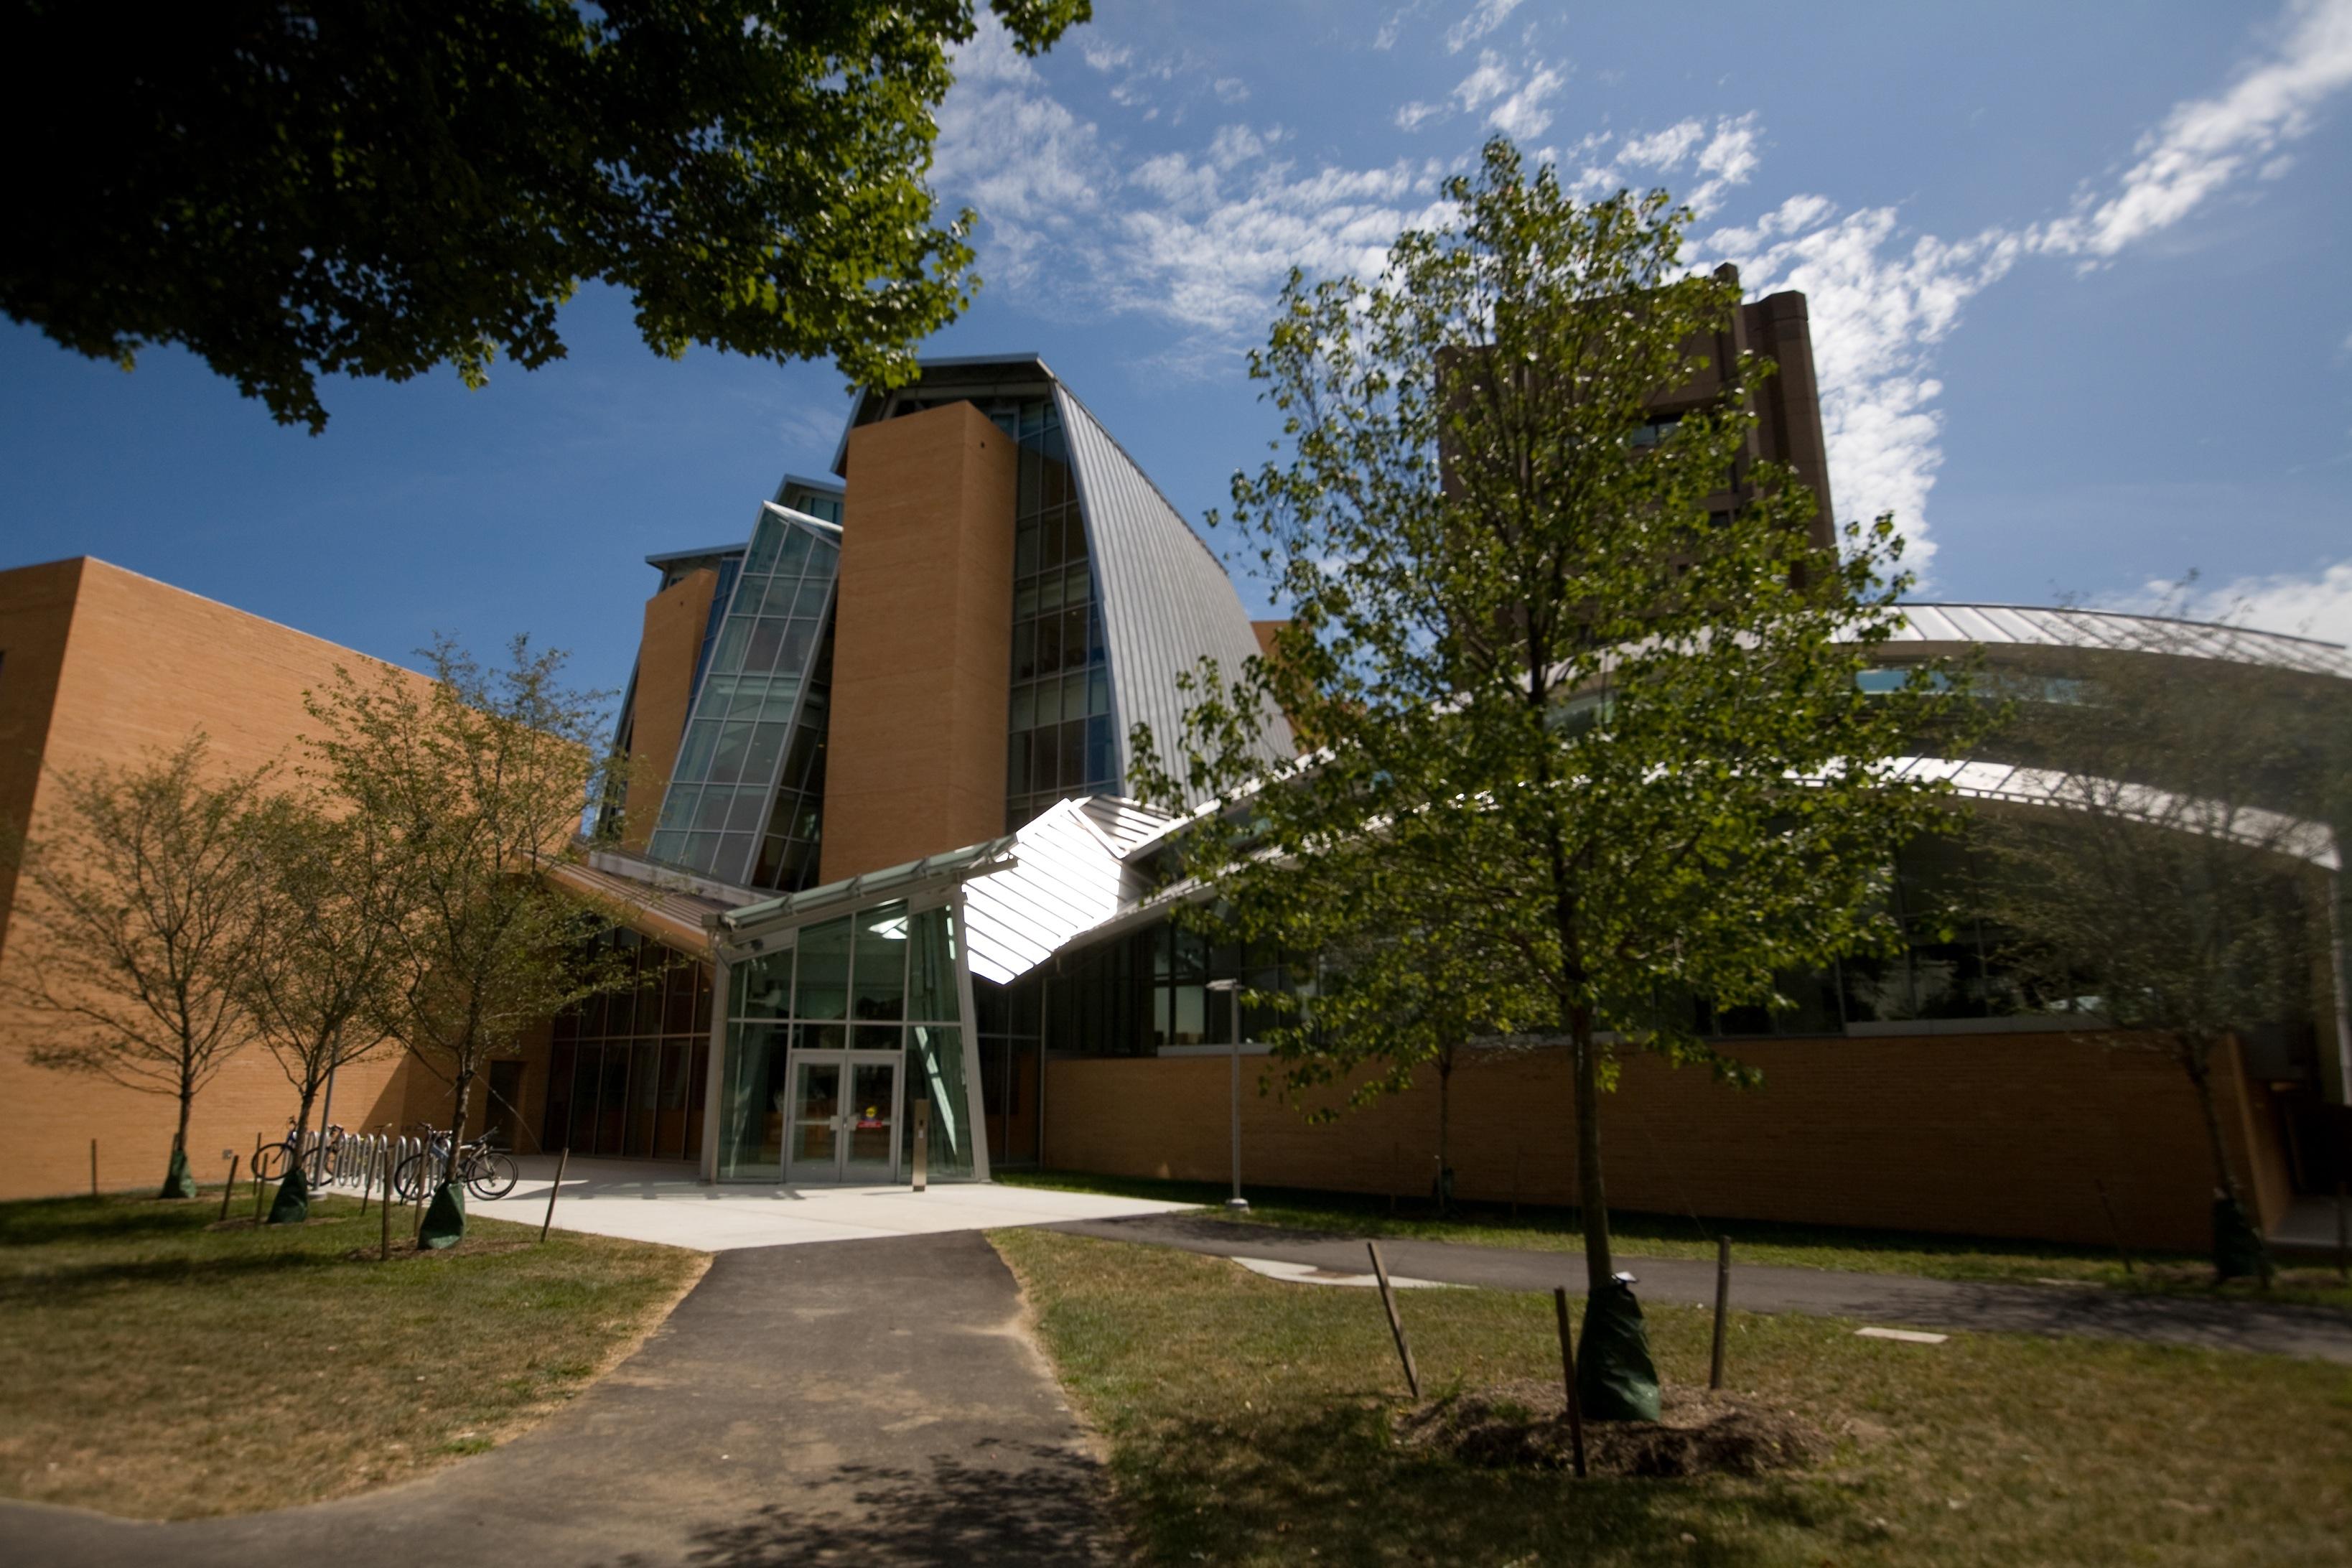 Areas of study princeton university autos post - Princeton university office of admissions ...